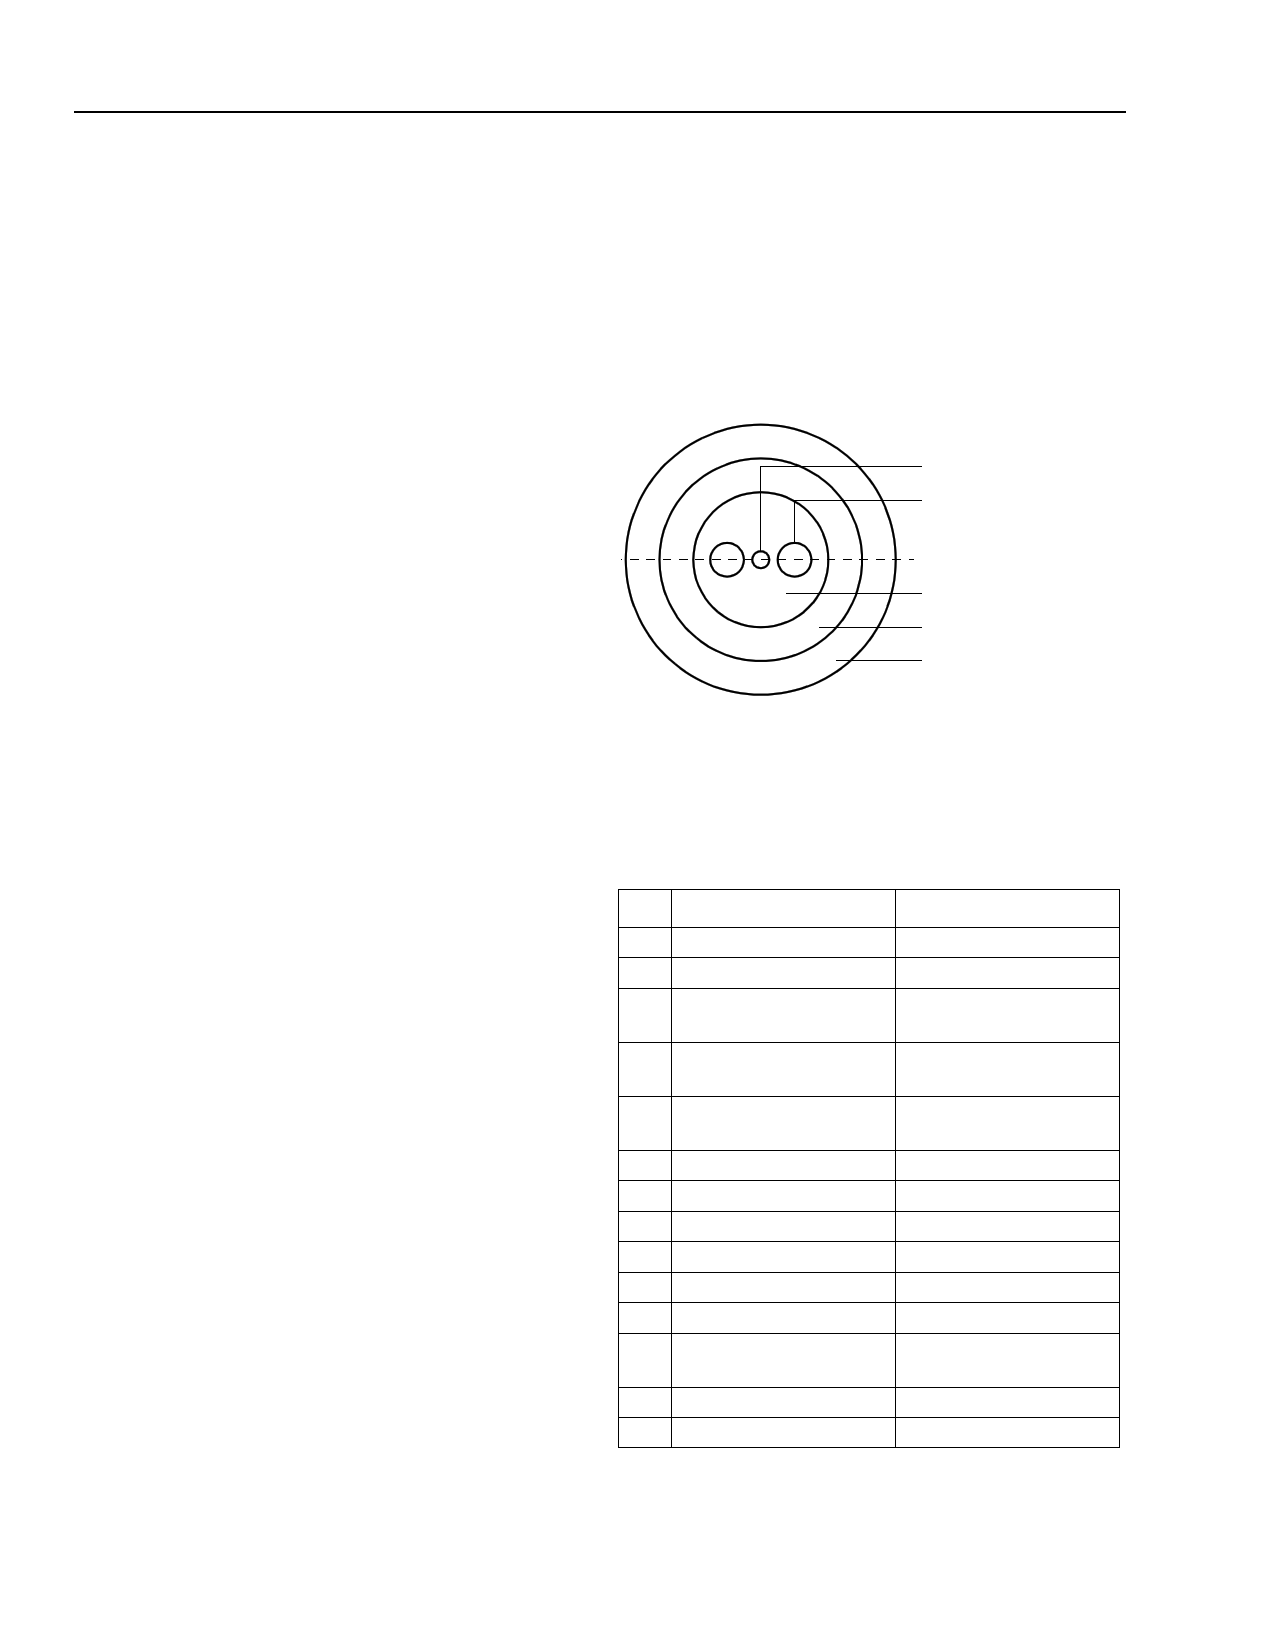 D2587P876 pdf, schematic